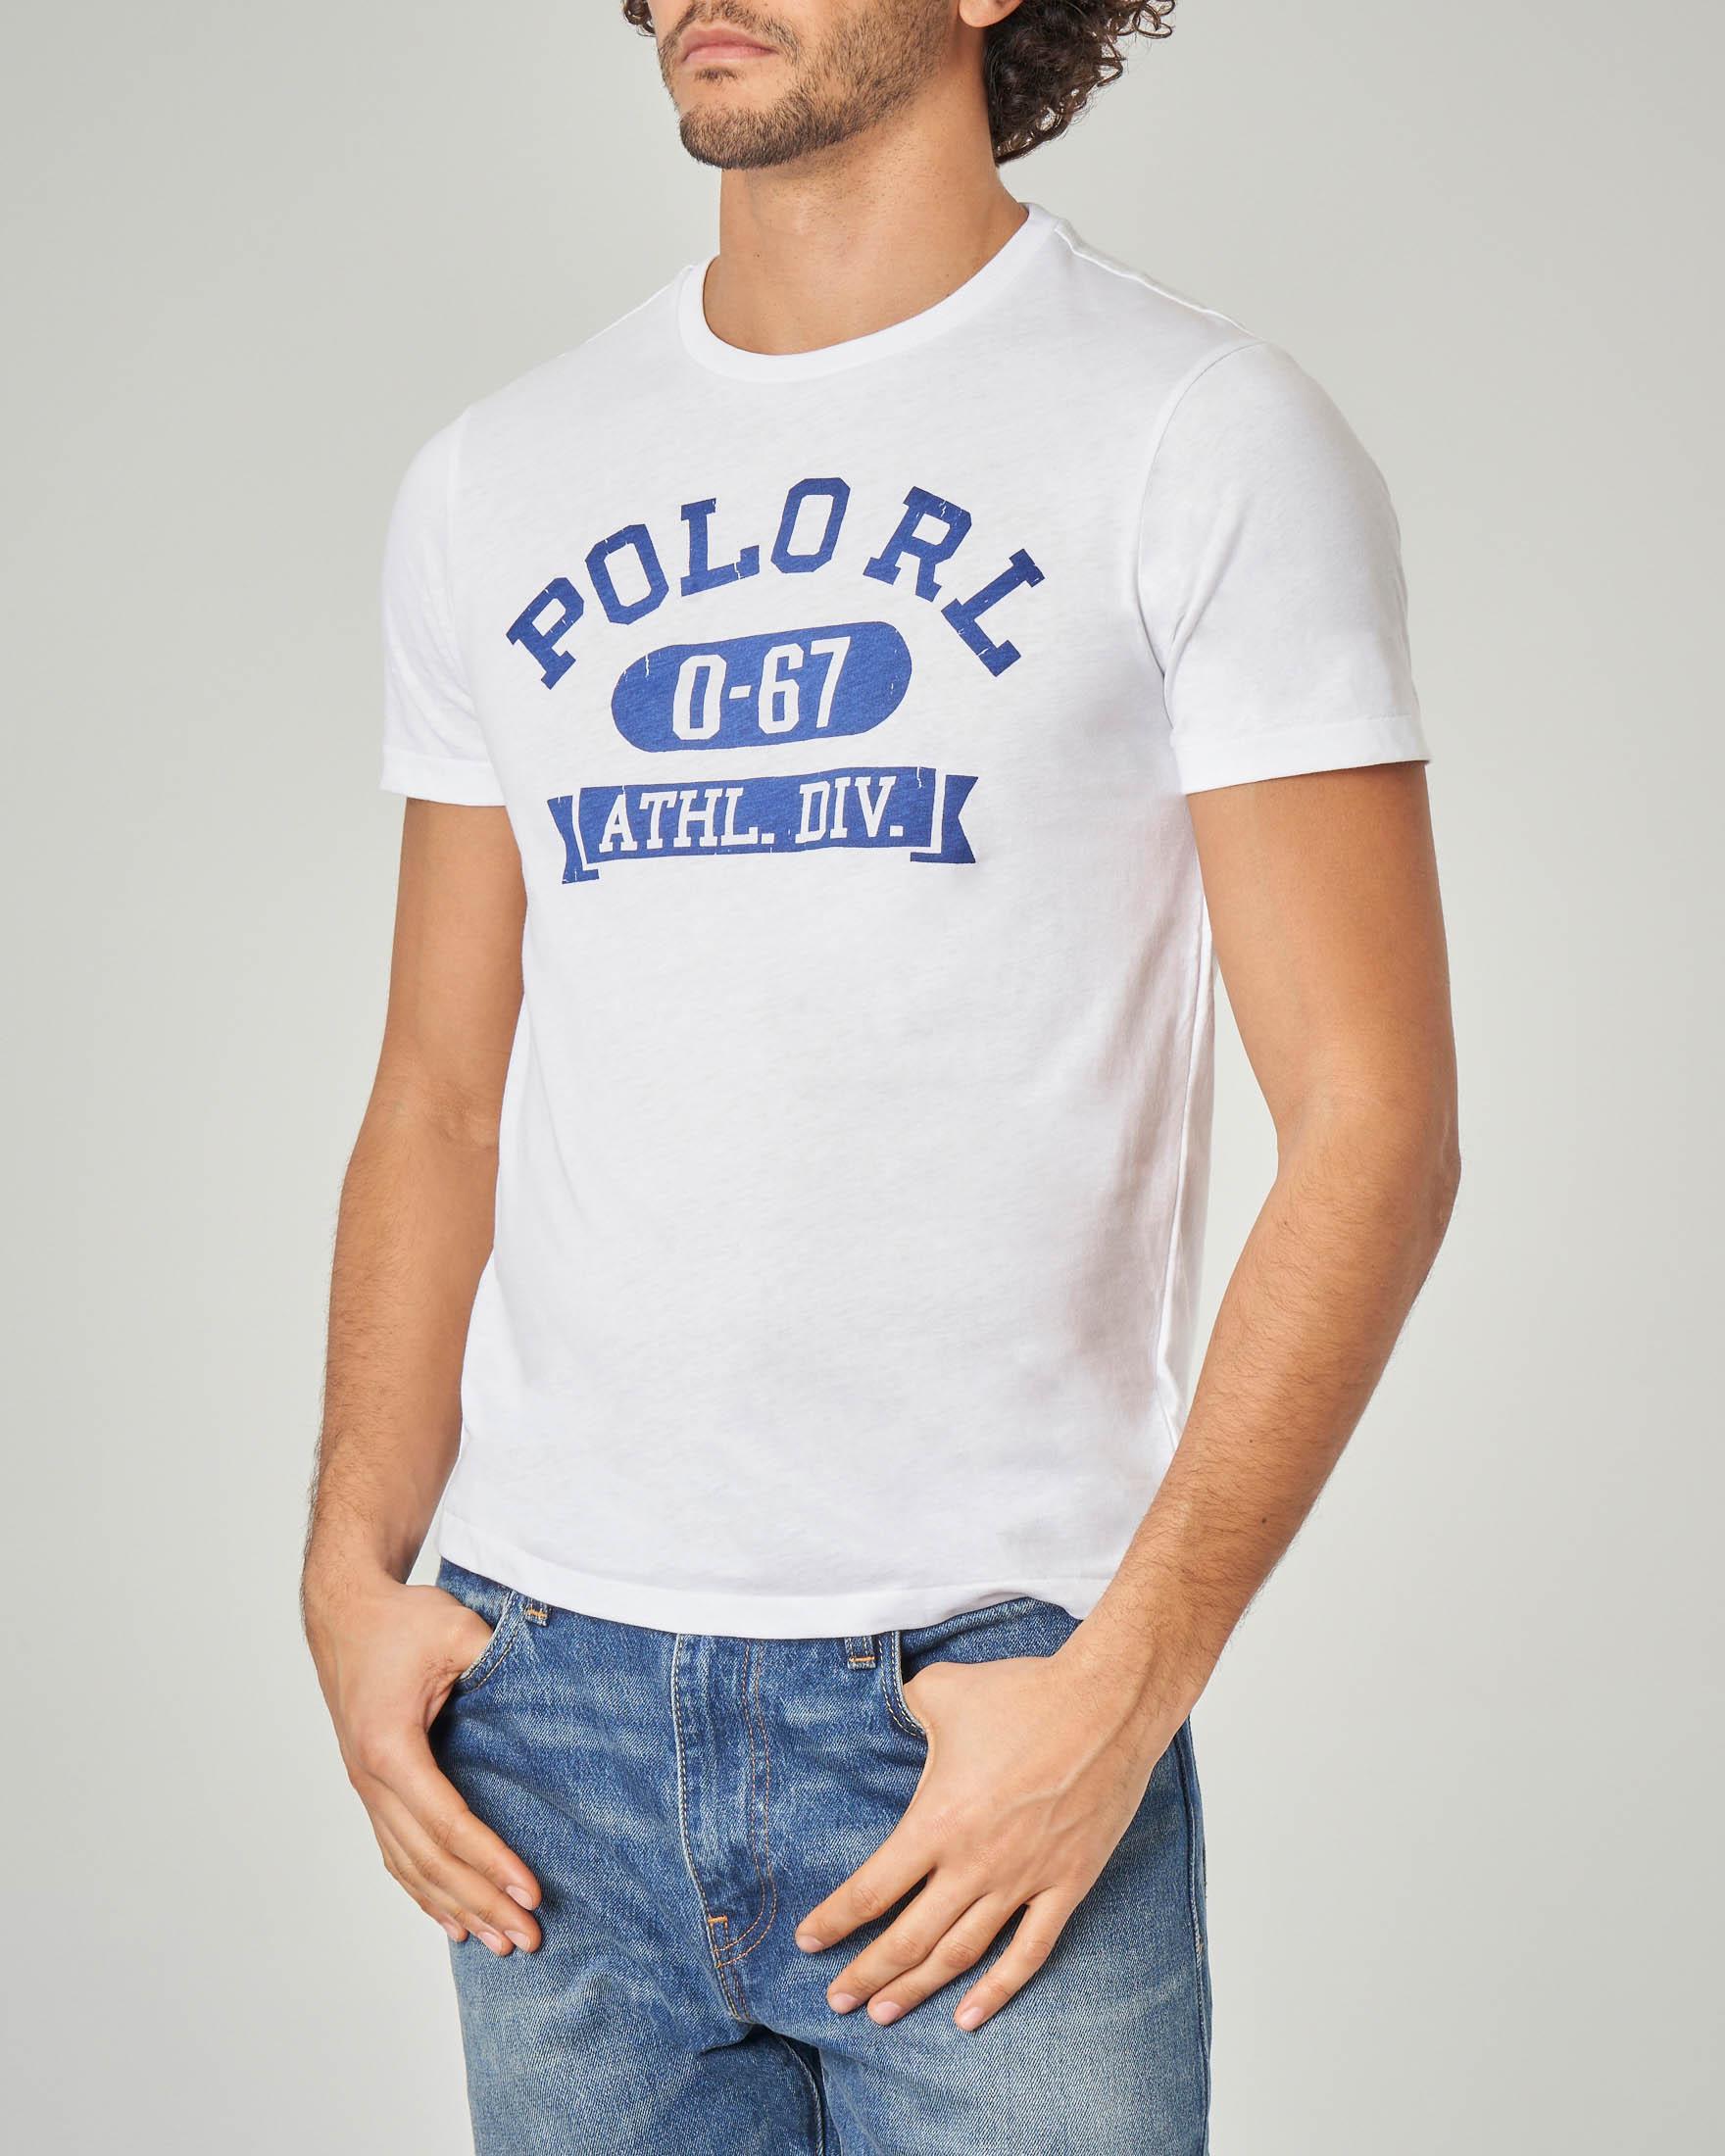 T-shirt bianca con scritte Polo RL blu